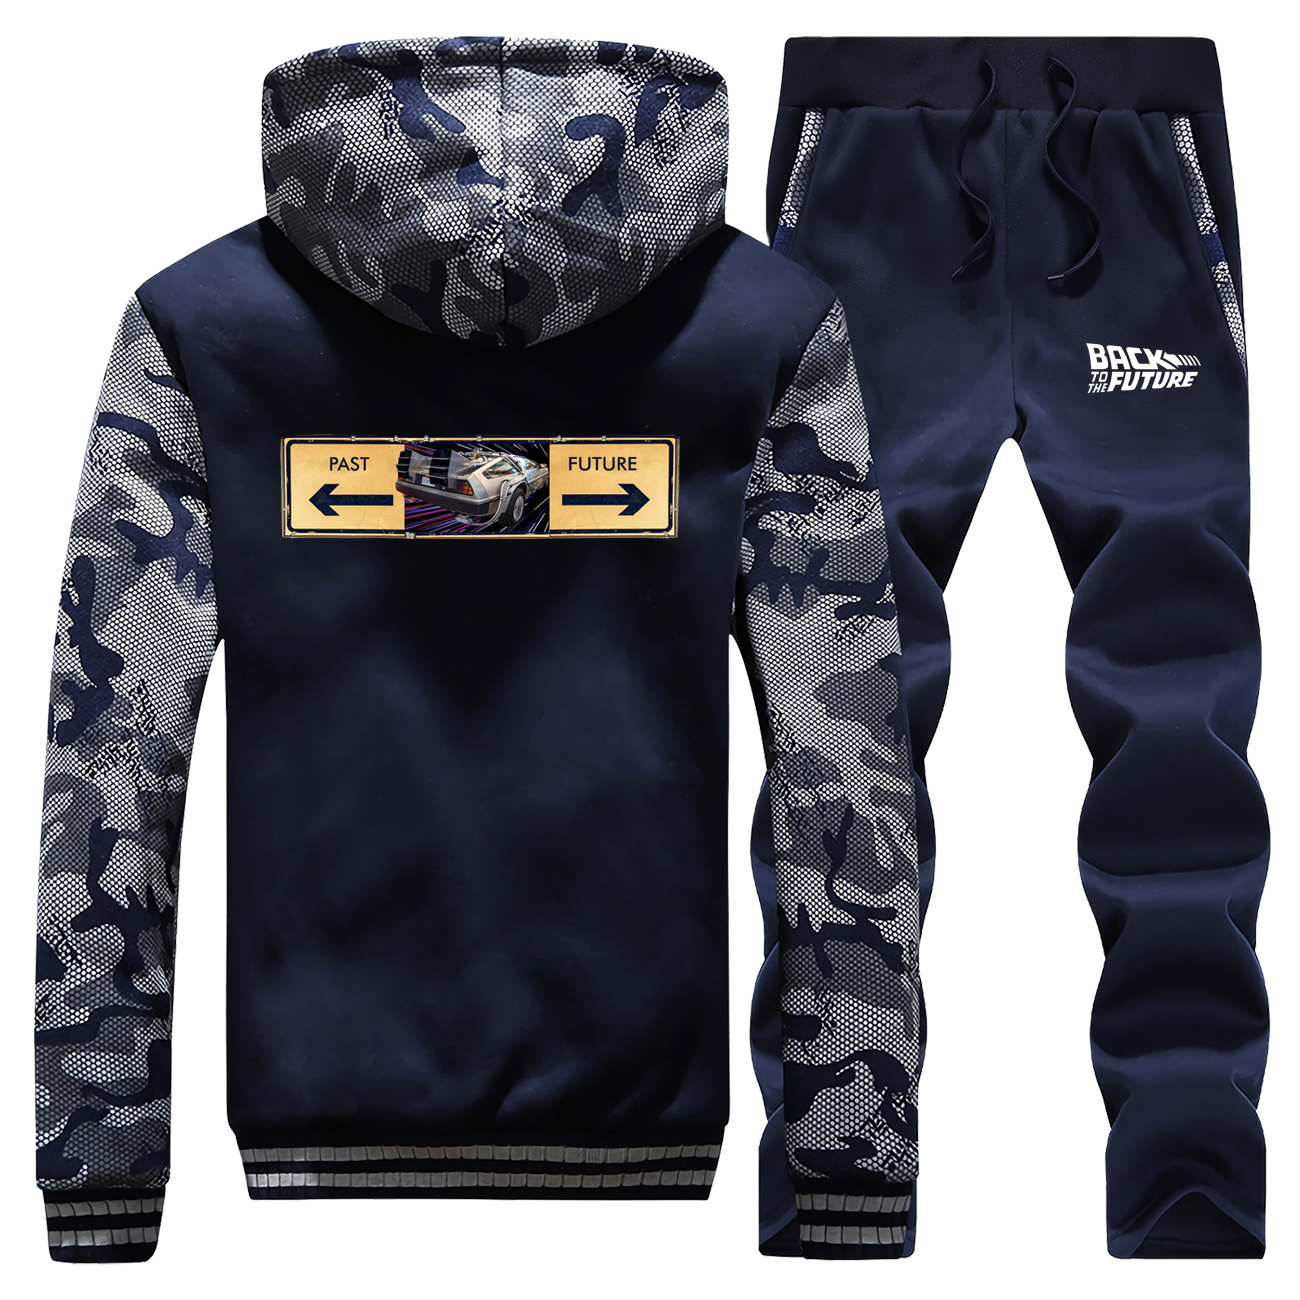 Back To The Future Men's Camo Sets Warm Thick  Jacket 2019 Winter Fleece Pants Sweatshirts Men Thicken Hoodies Men's Tracksuit